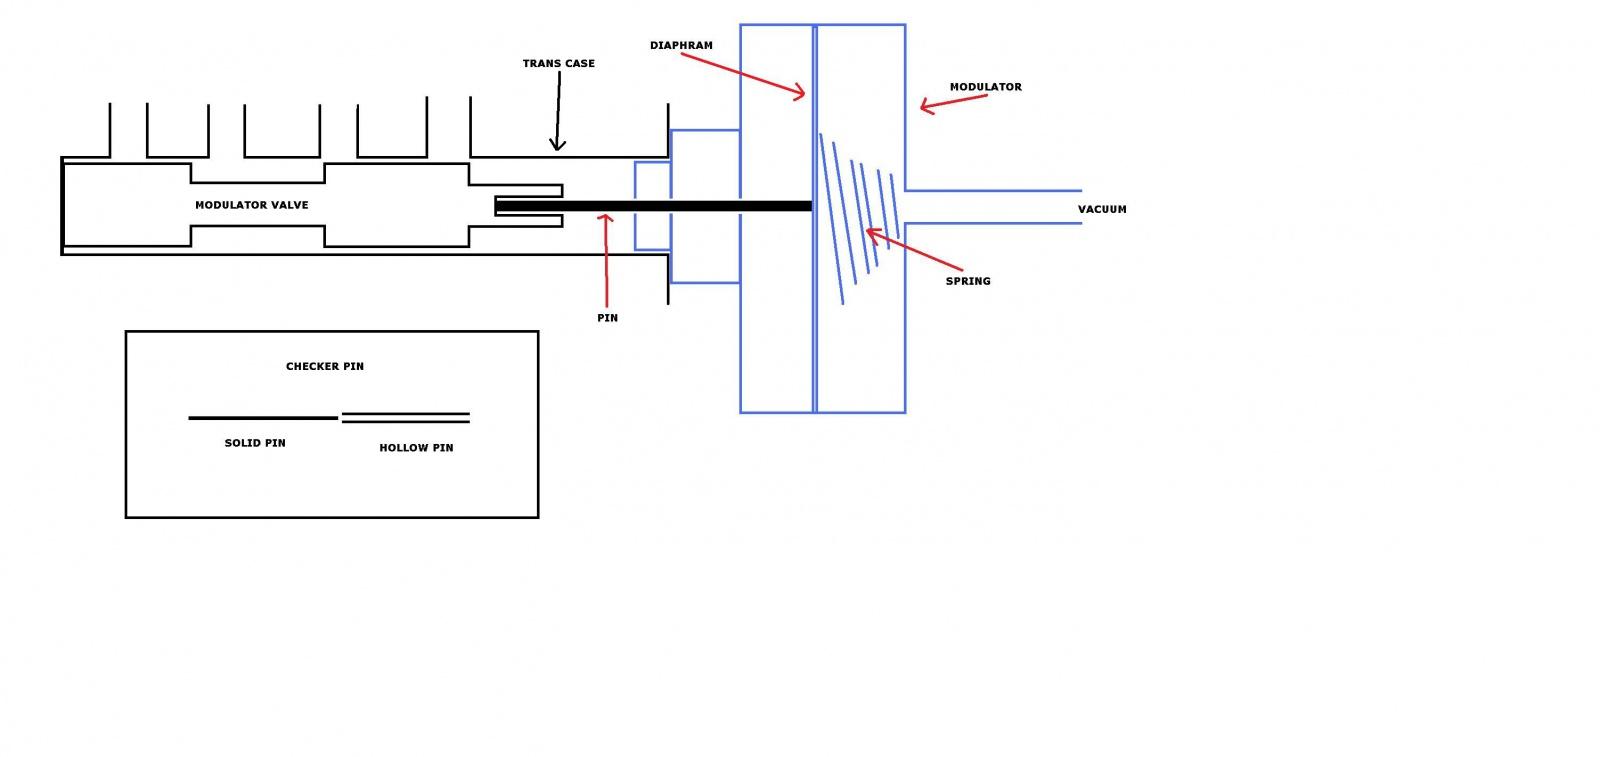 fine tuning my c6- shifting behavior - page 2